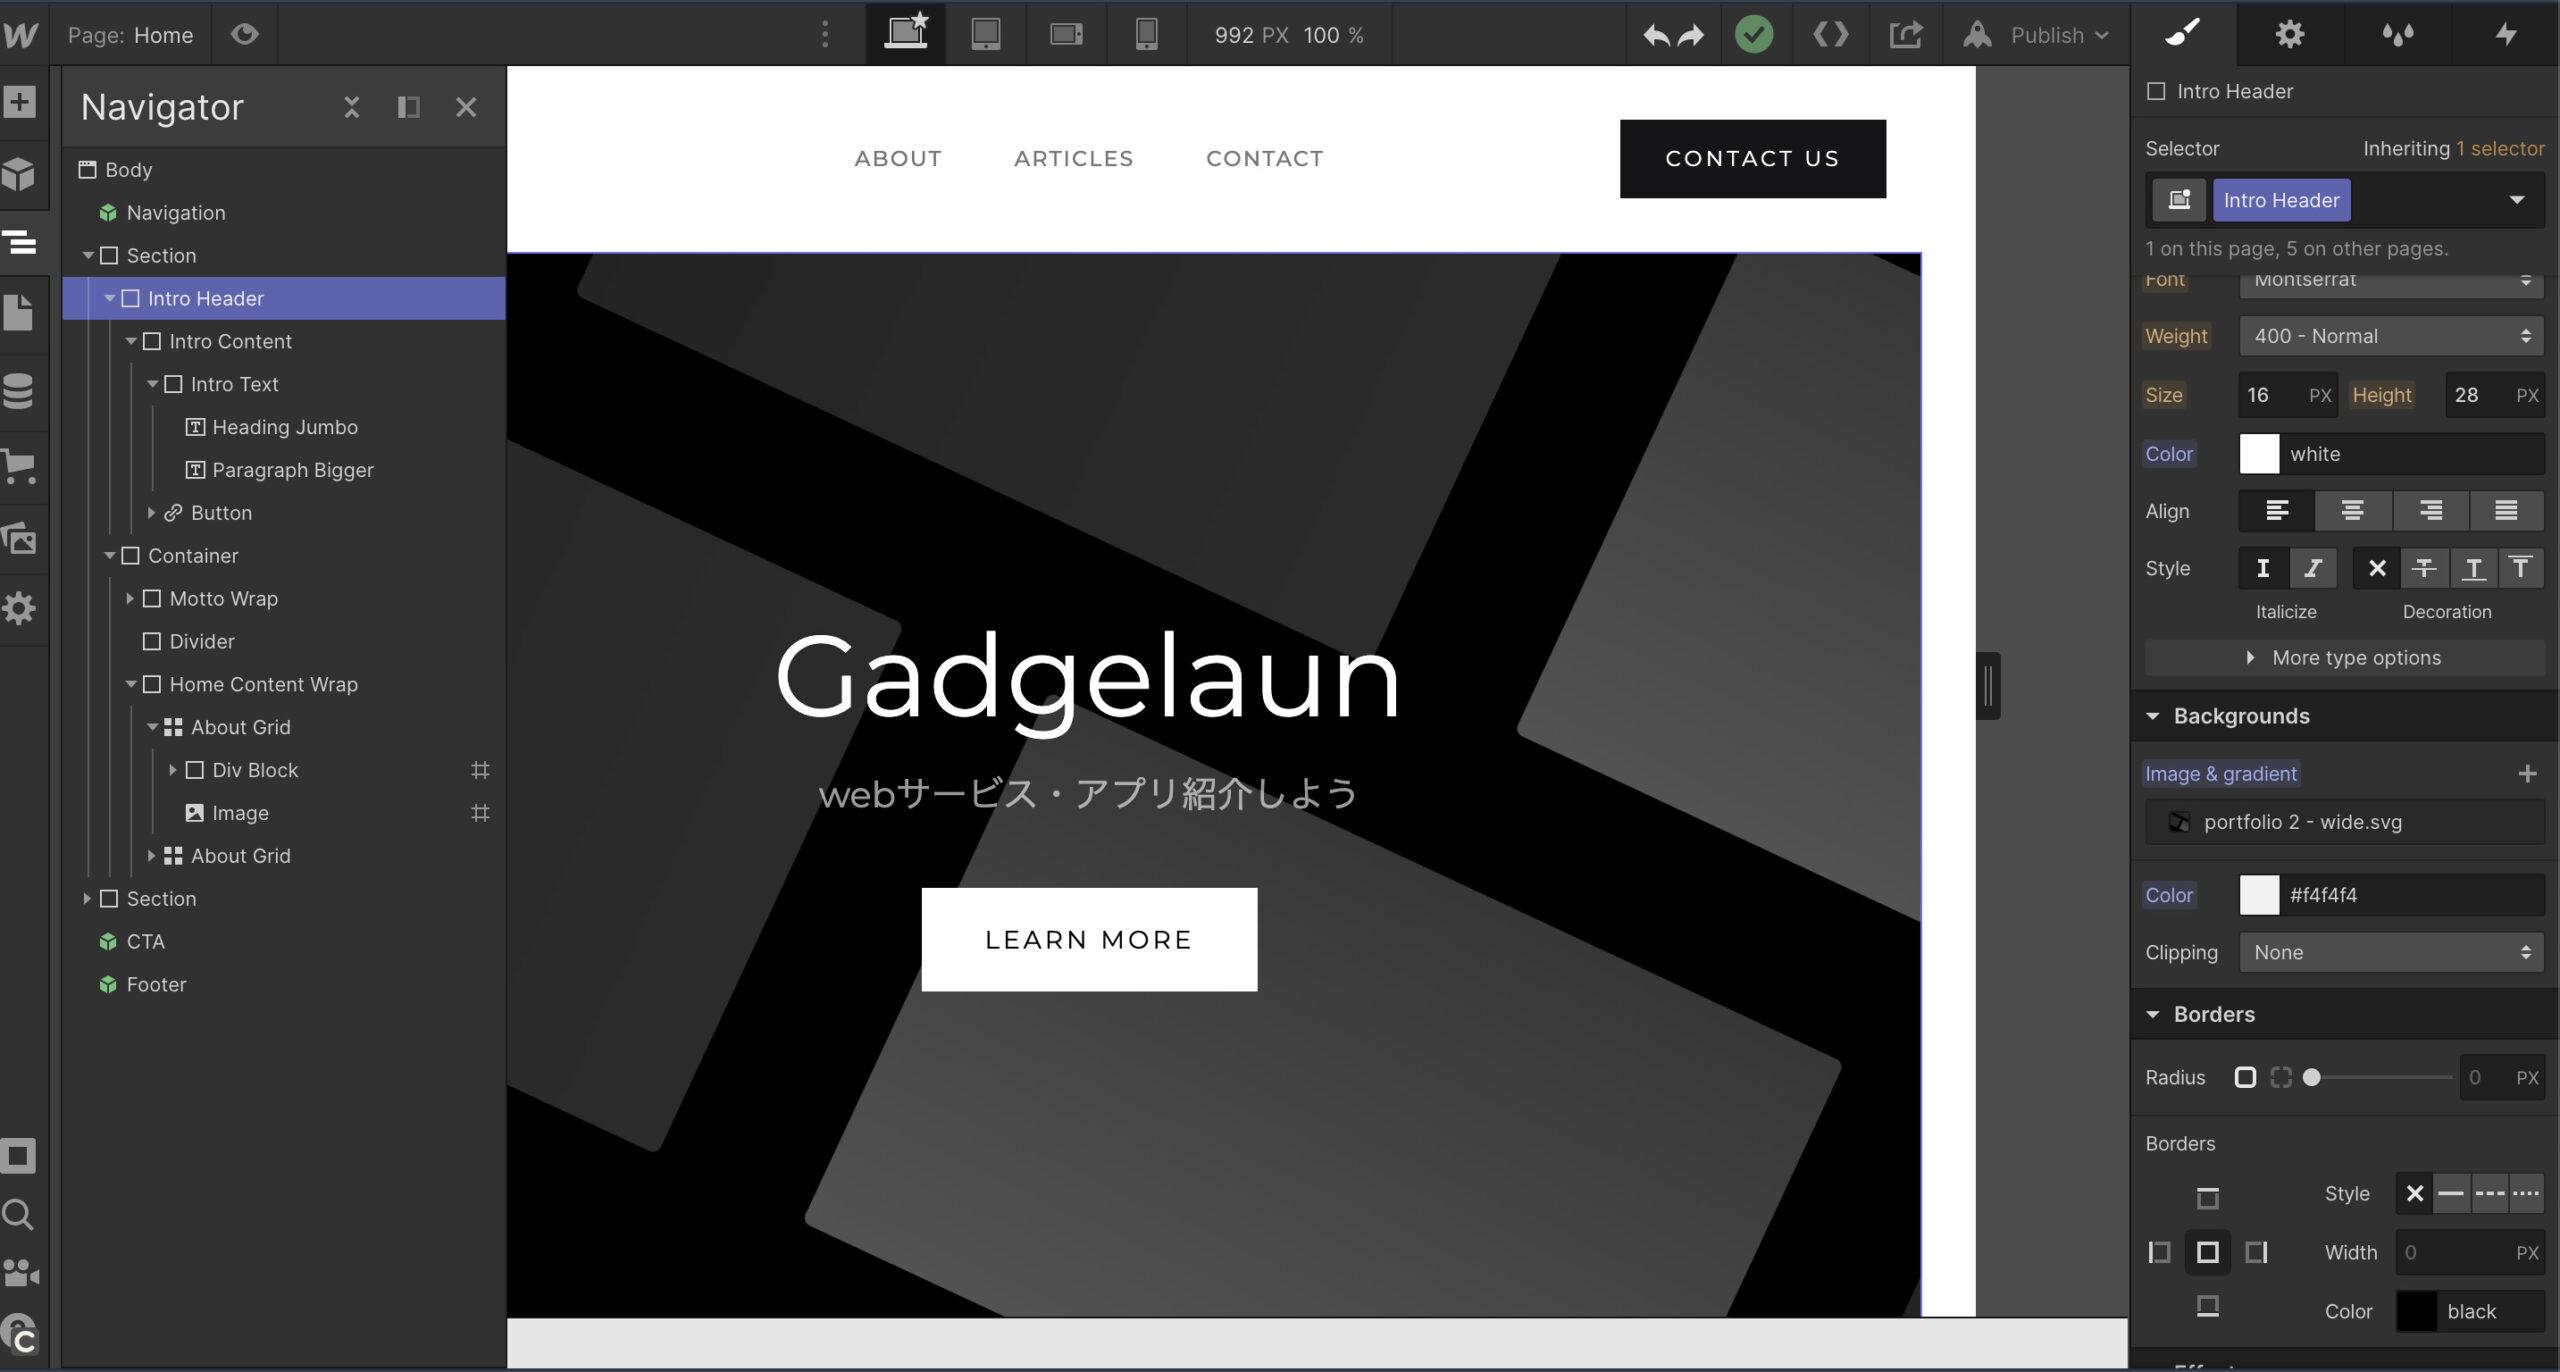 【webflowの使い方】ノーコードツールでwebサイト制作に触れてみる